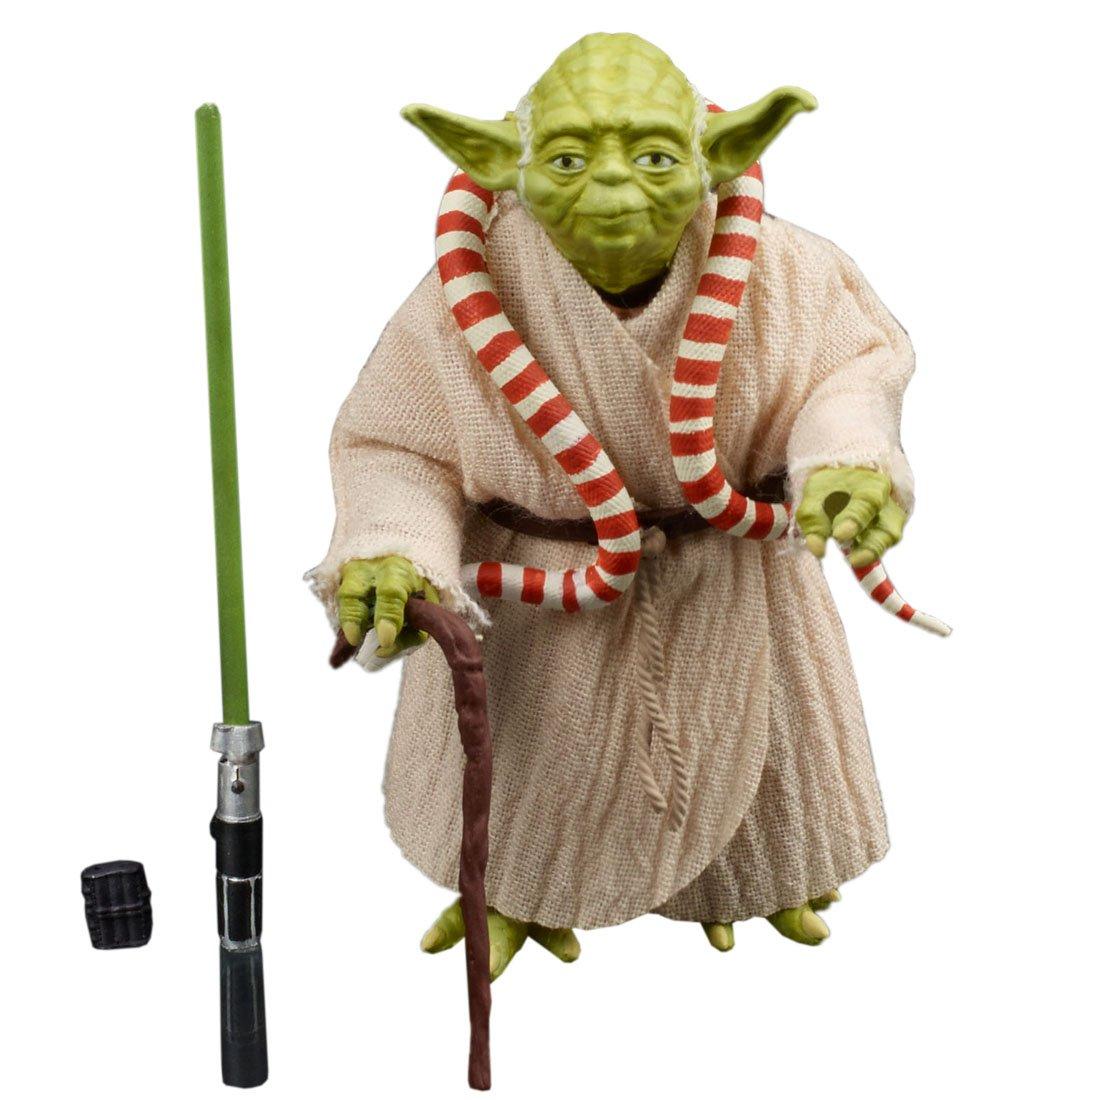 Serie Star Wars Negro 6 pulgadas figura de Yoda longitud total de 6 pulgadas figura de accioen de pintado